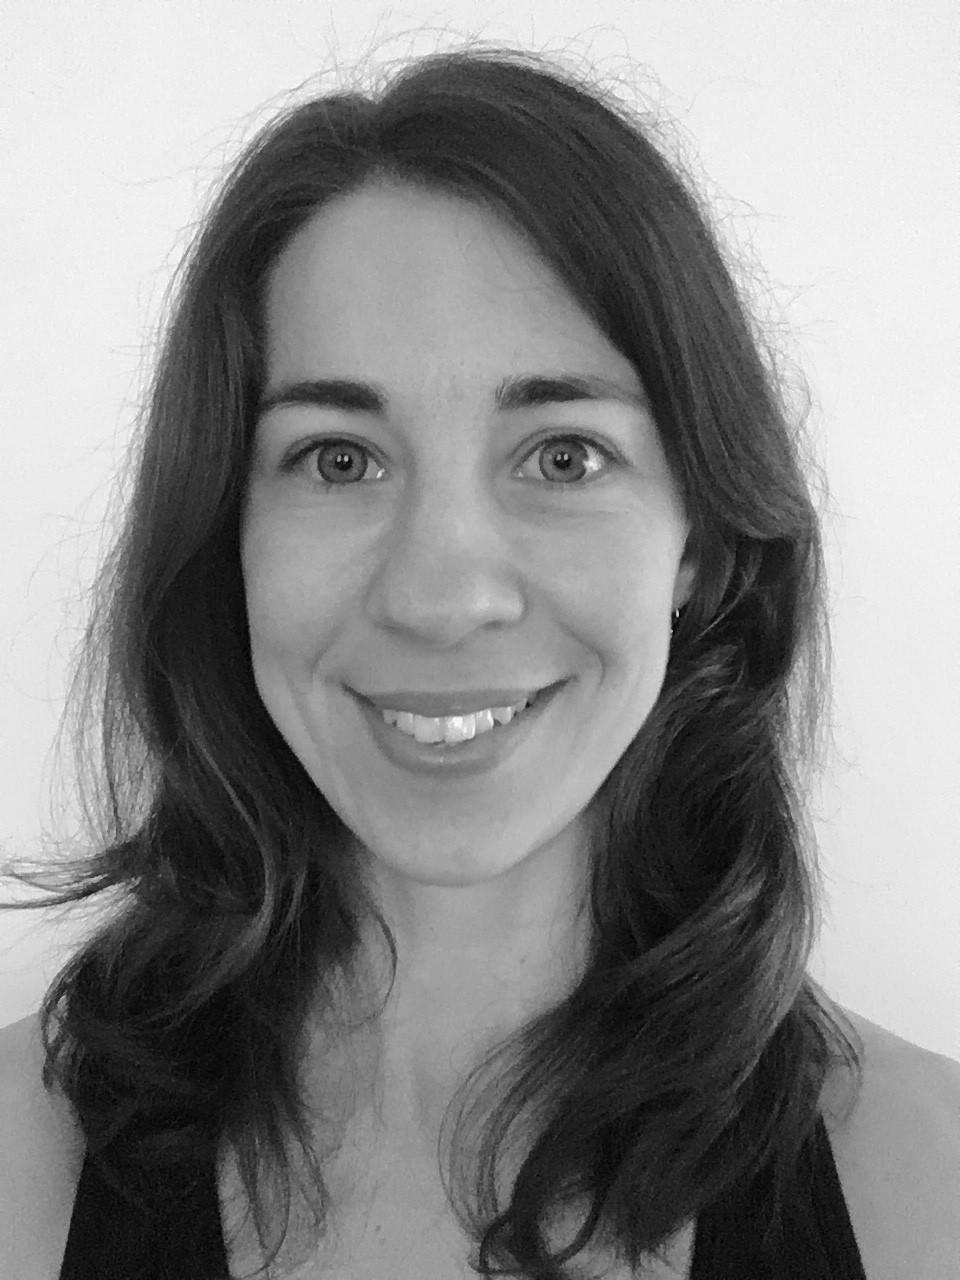 Mariana Camiloti Pilates teacher